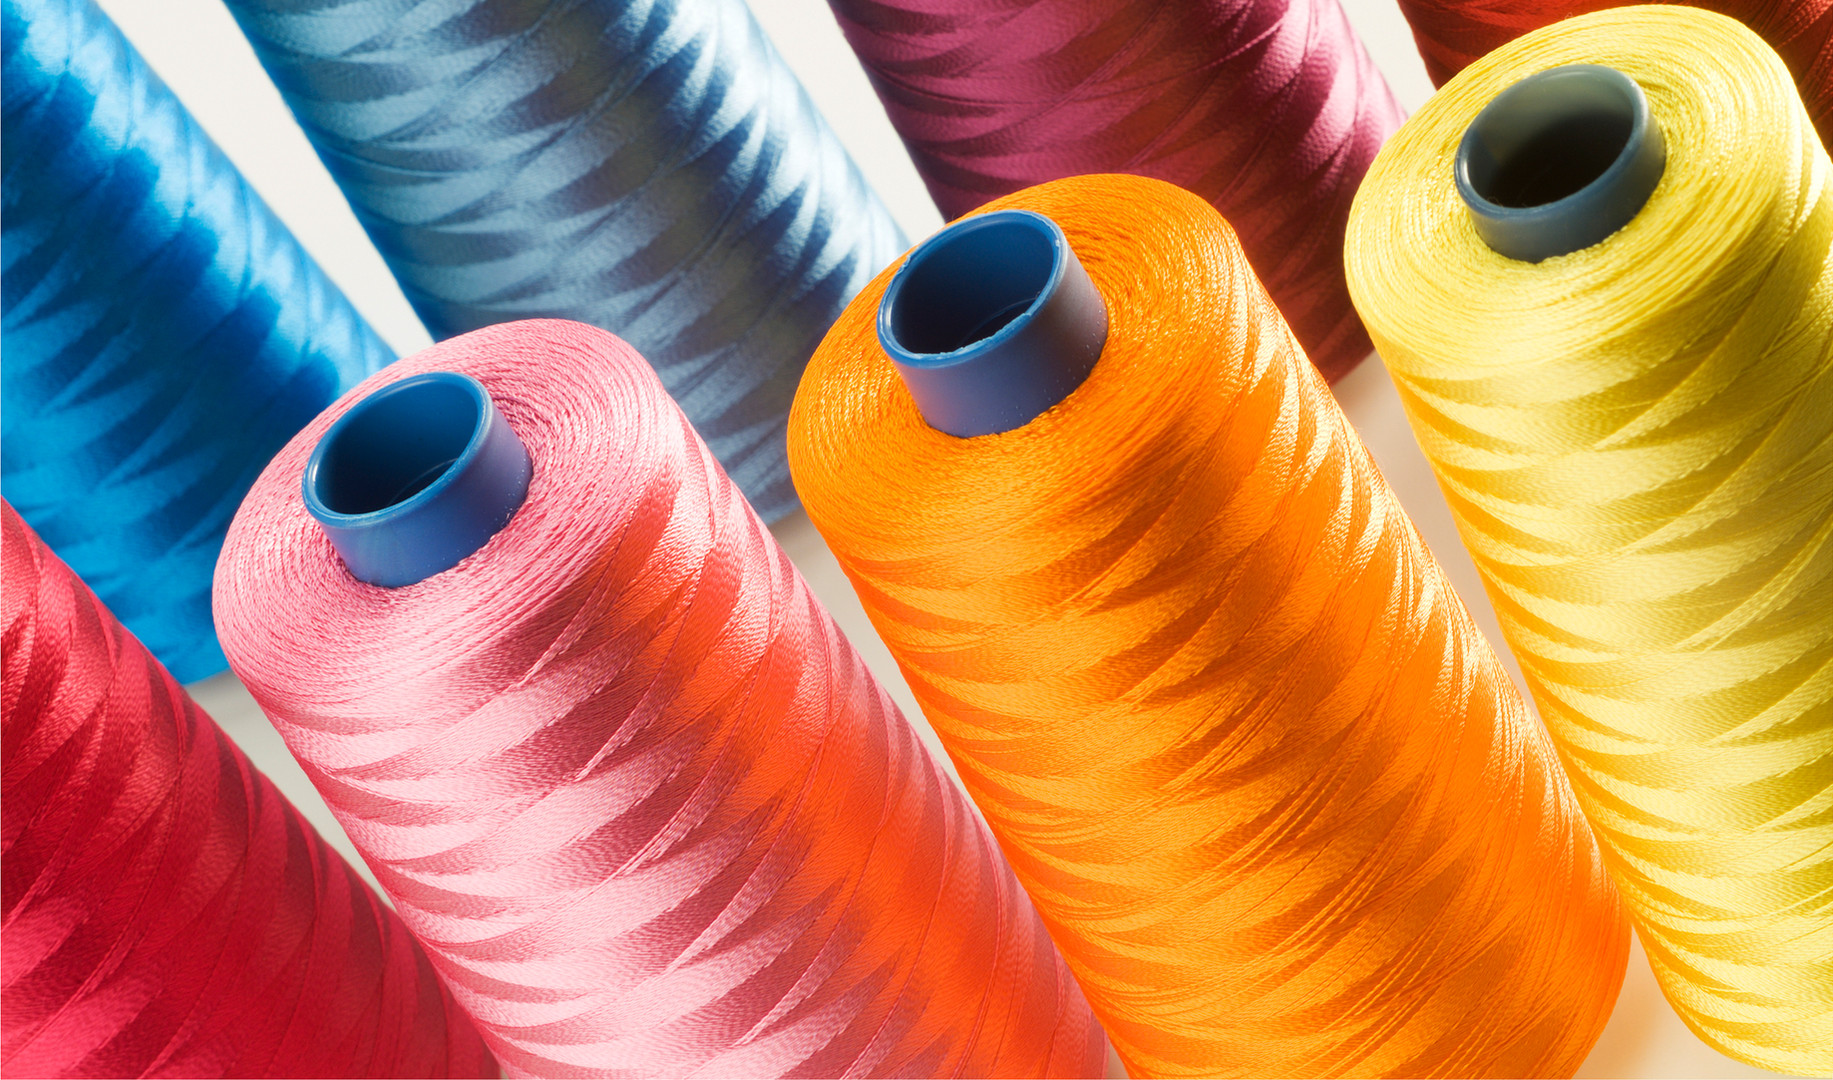 Hilo de coser colorido